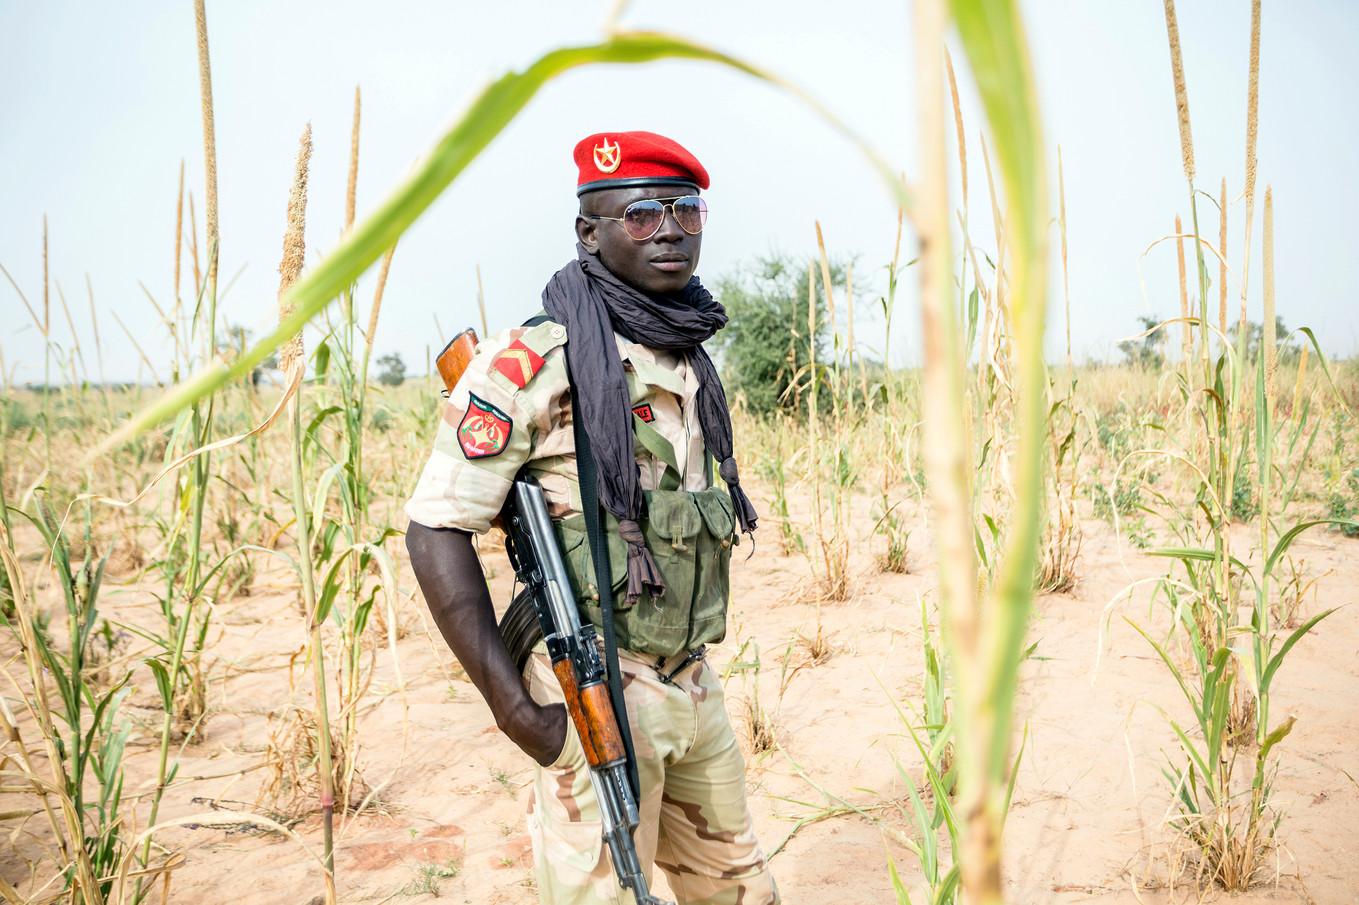 NGO_CSR-CARE-Niger 022.jpg